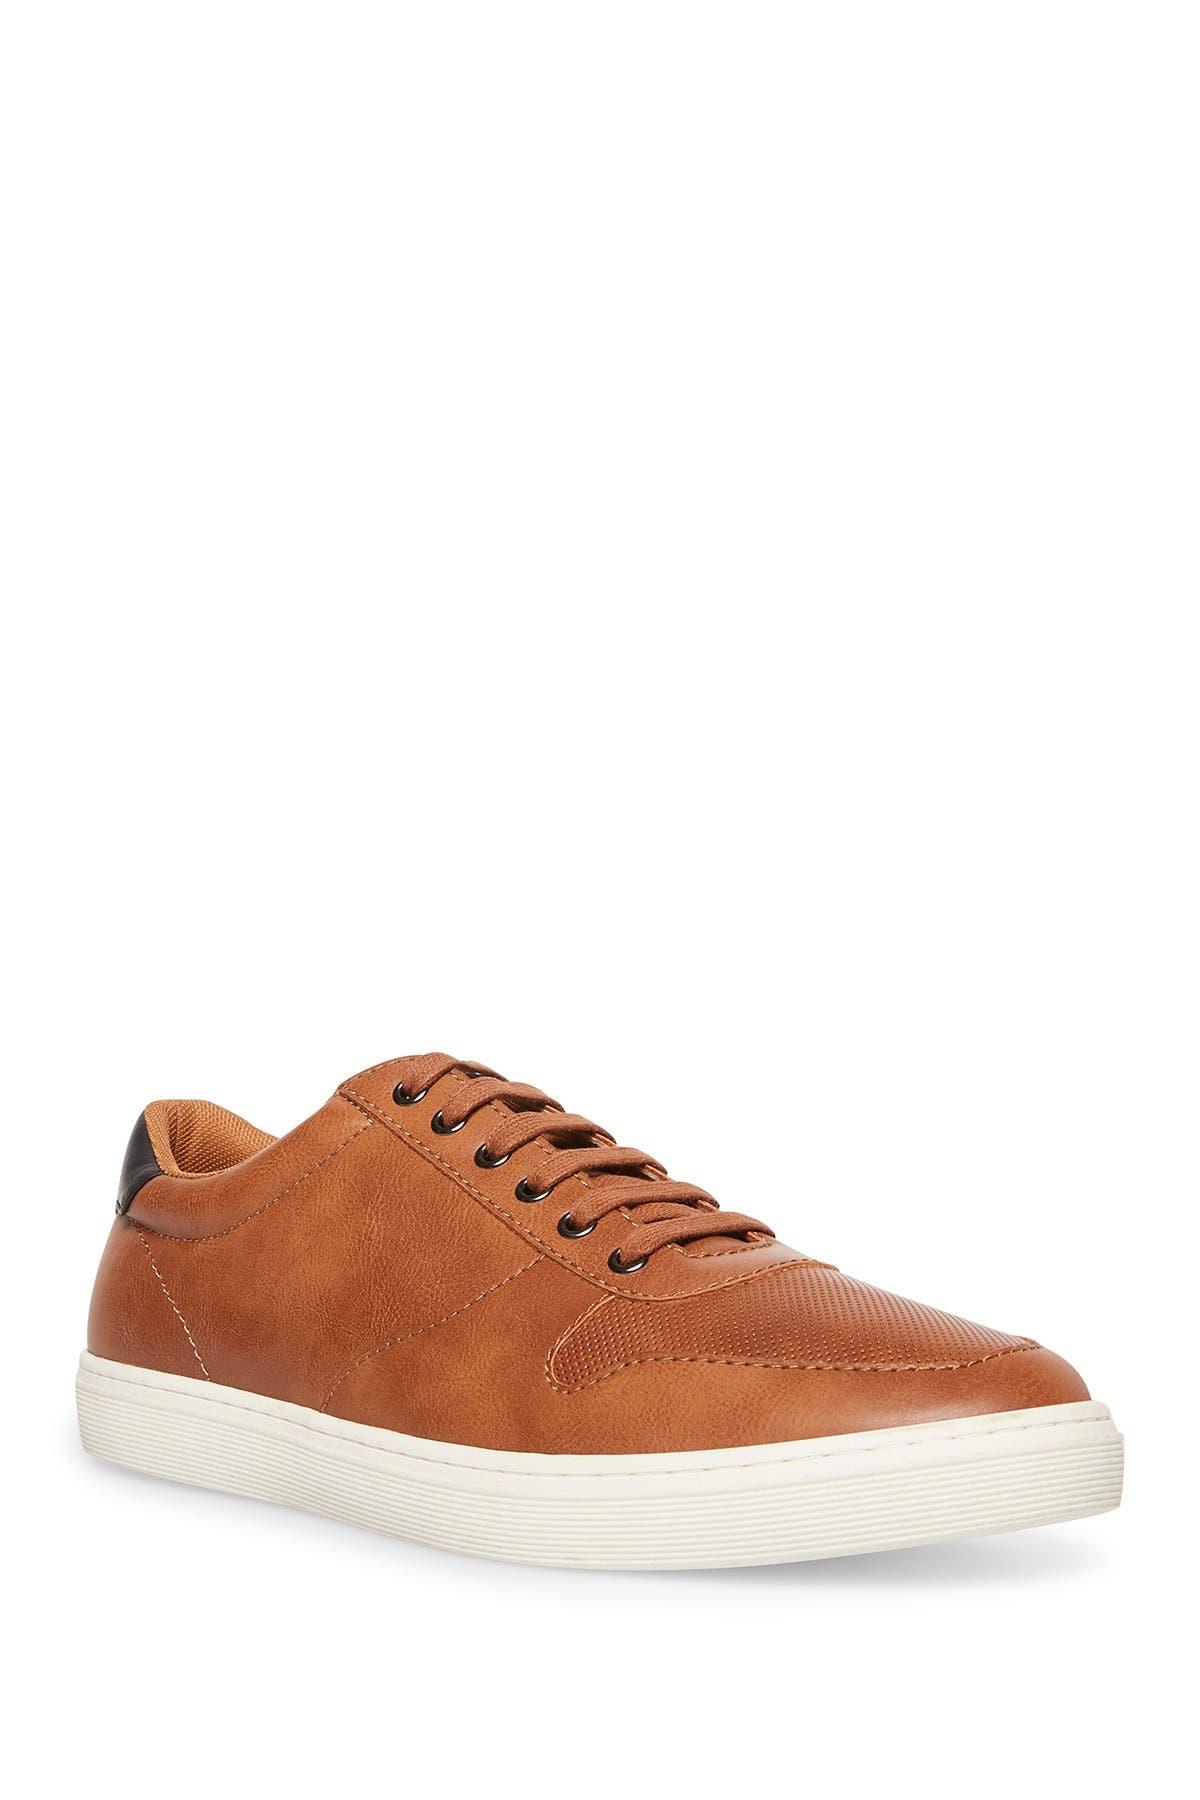 Image of Madden Daiben Sneaker